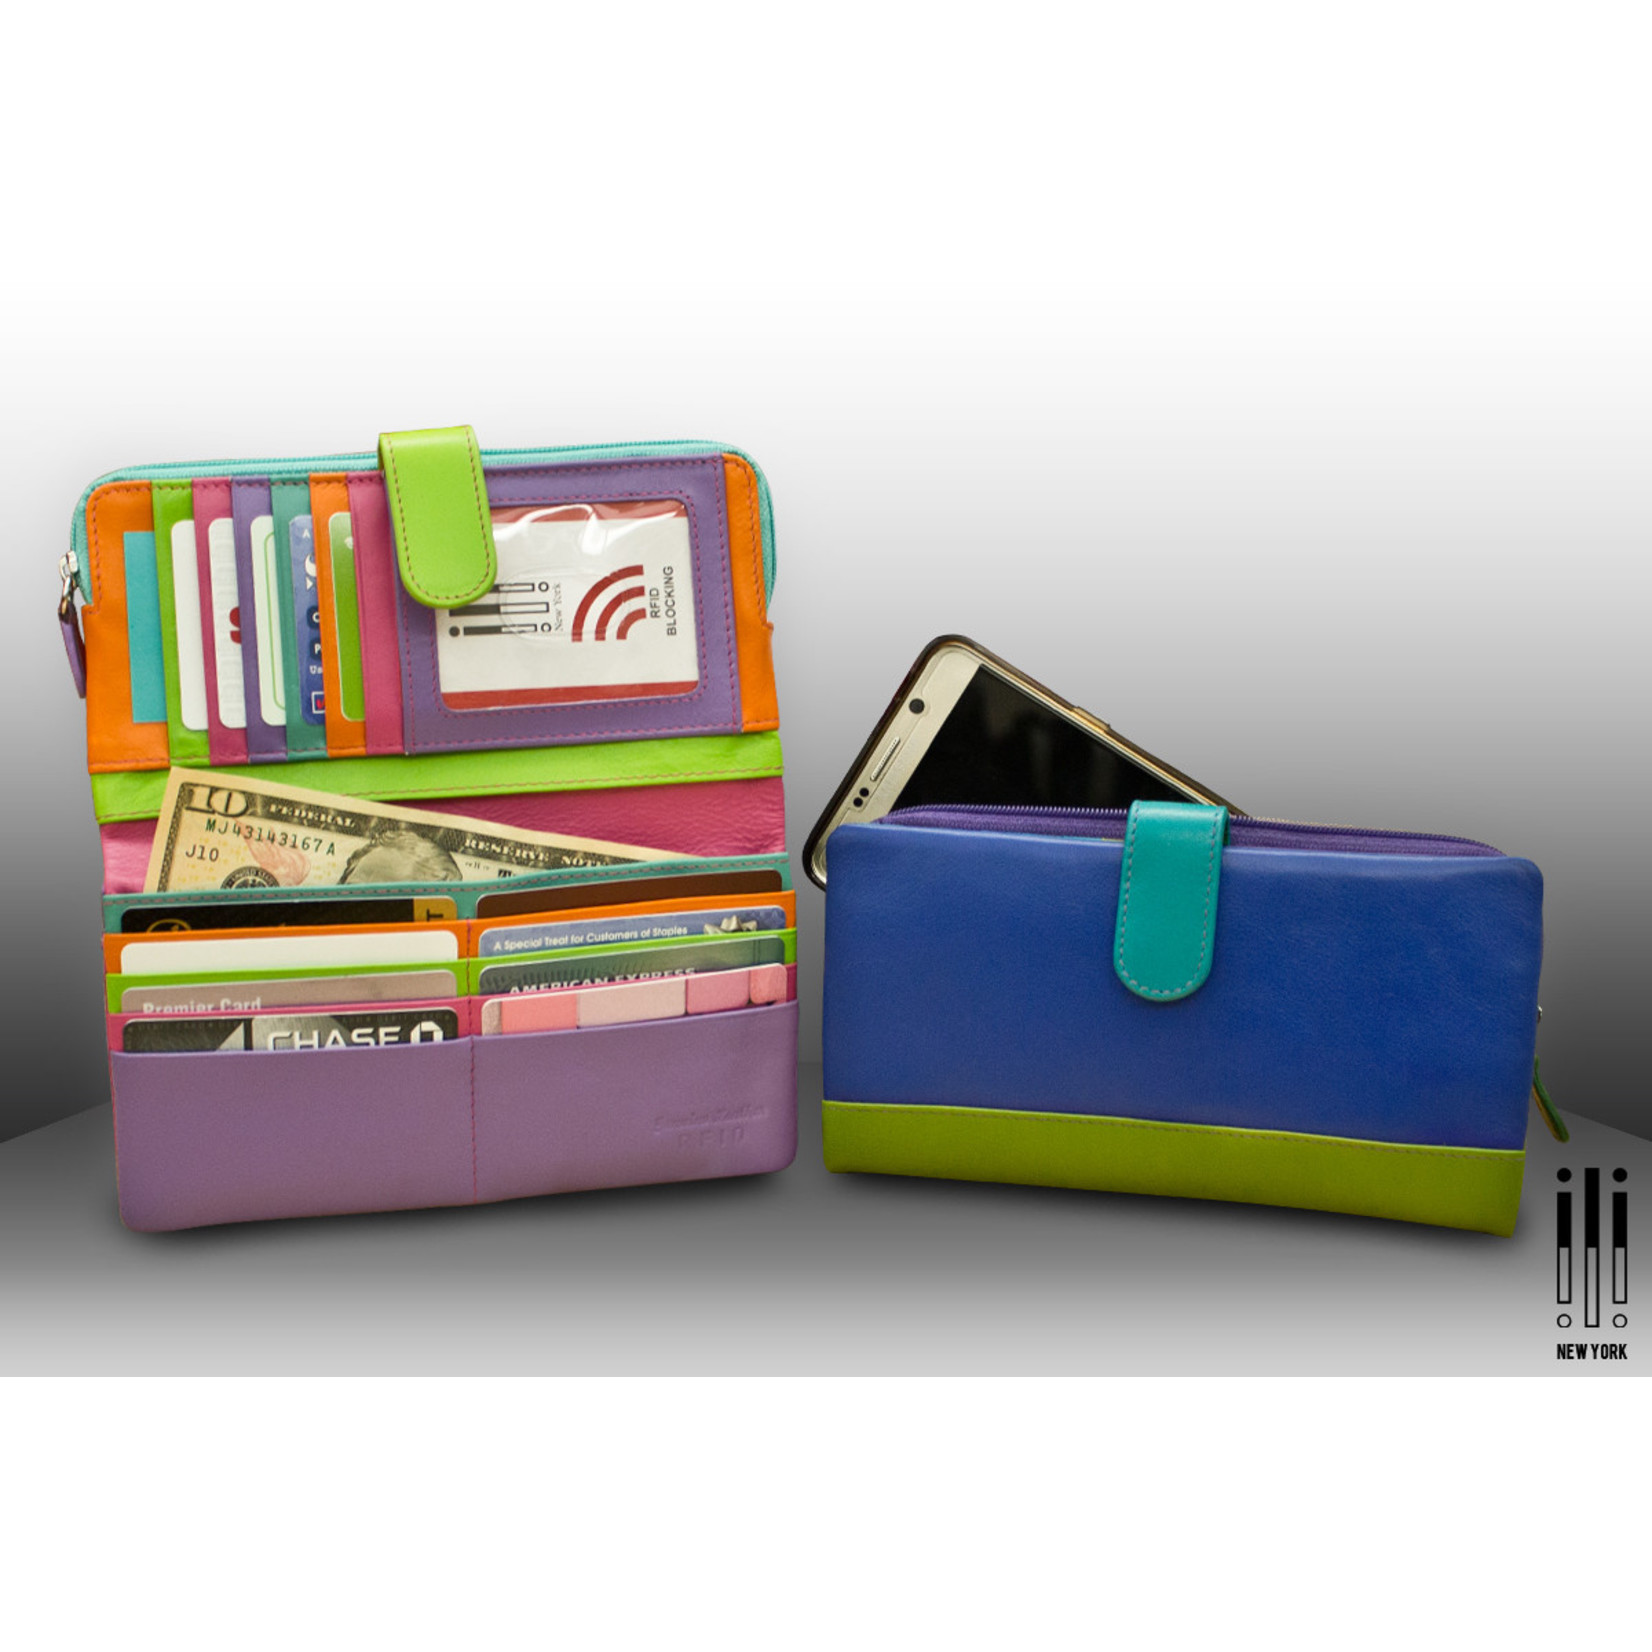 Leather Handbags and Accessories 7420 Mykonos - RFID Smartphone Wallet